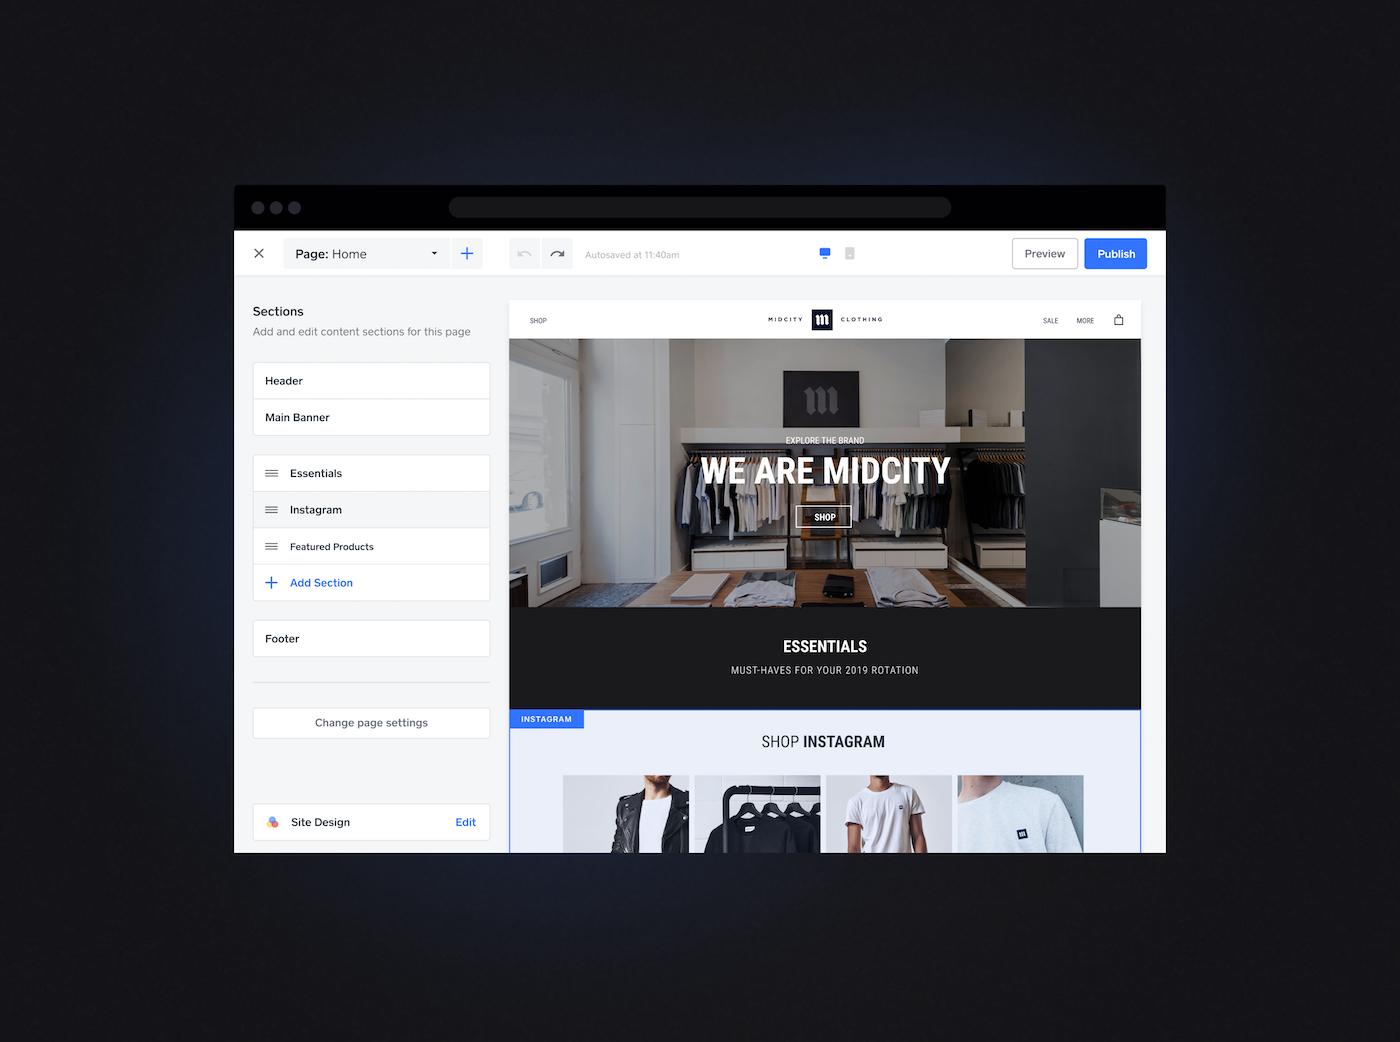 Screenshot of Square ecommerce platform.